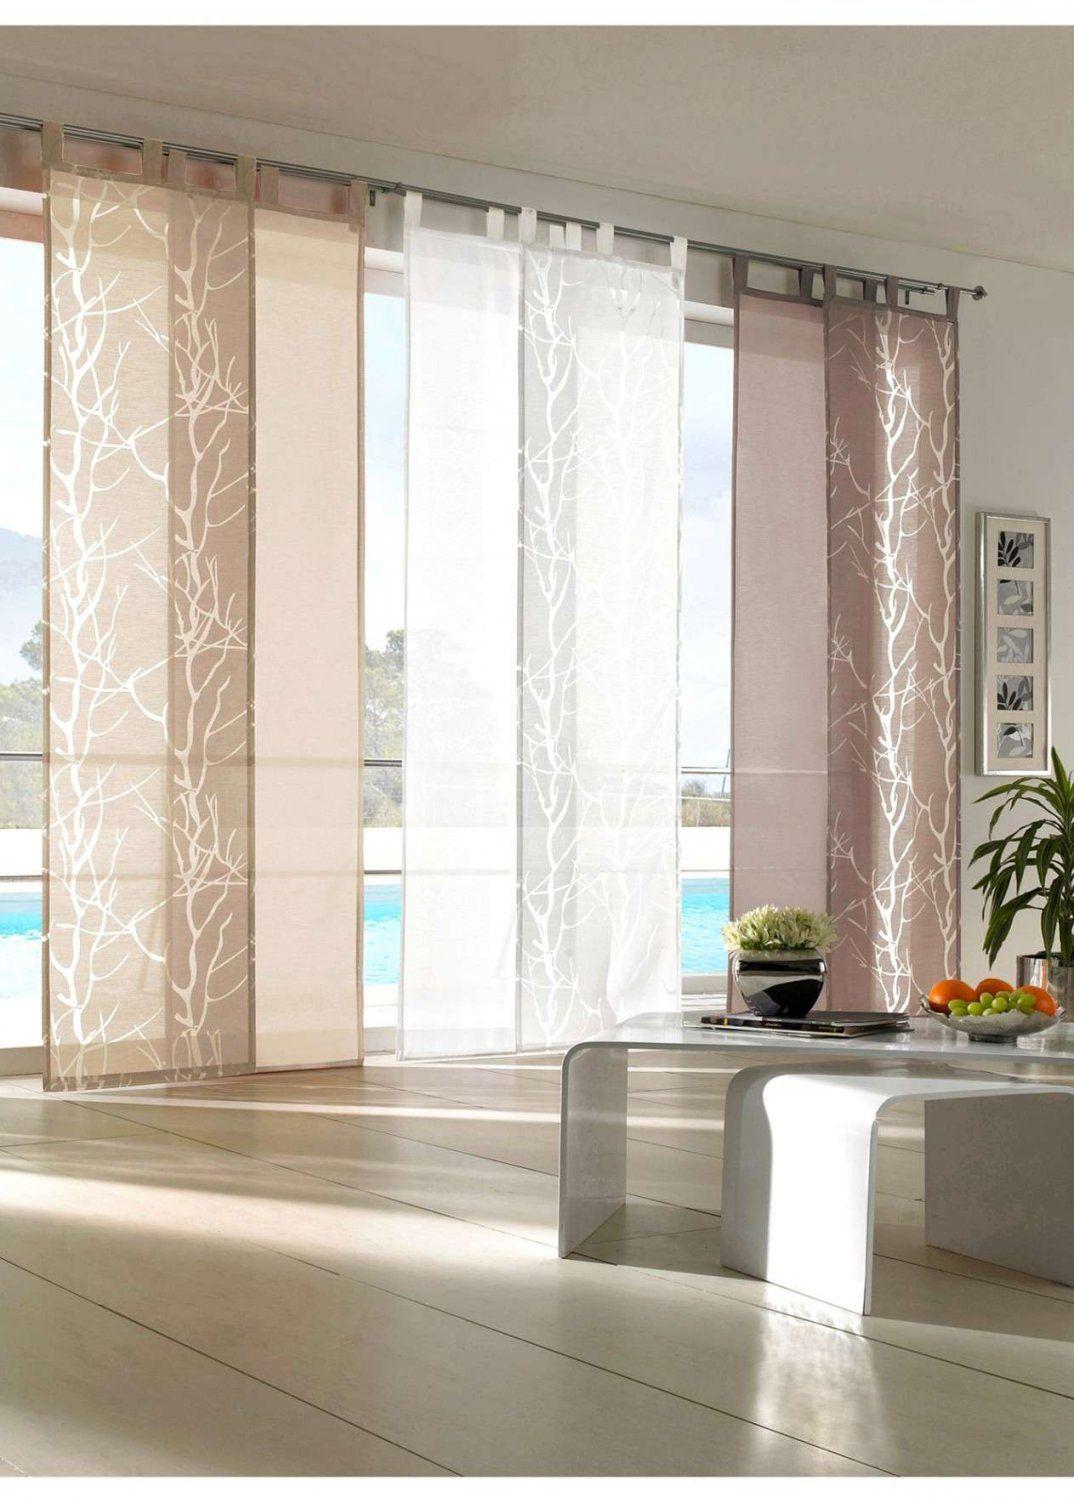 Fensterdeko badezimmer top design gardinen ideen - Ubergardinen wohnzimmer ...